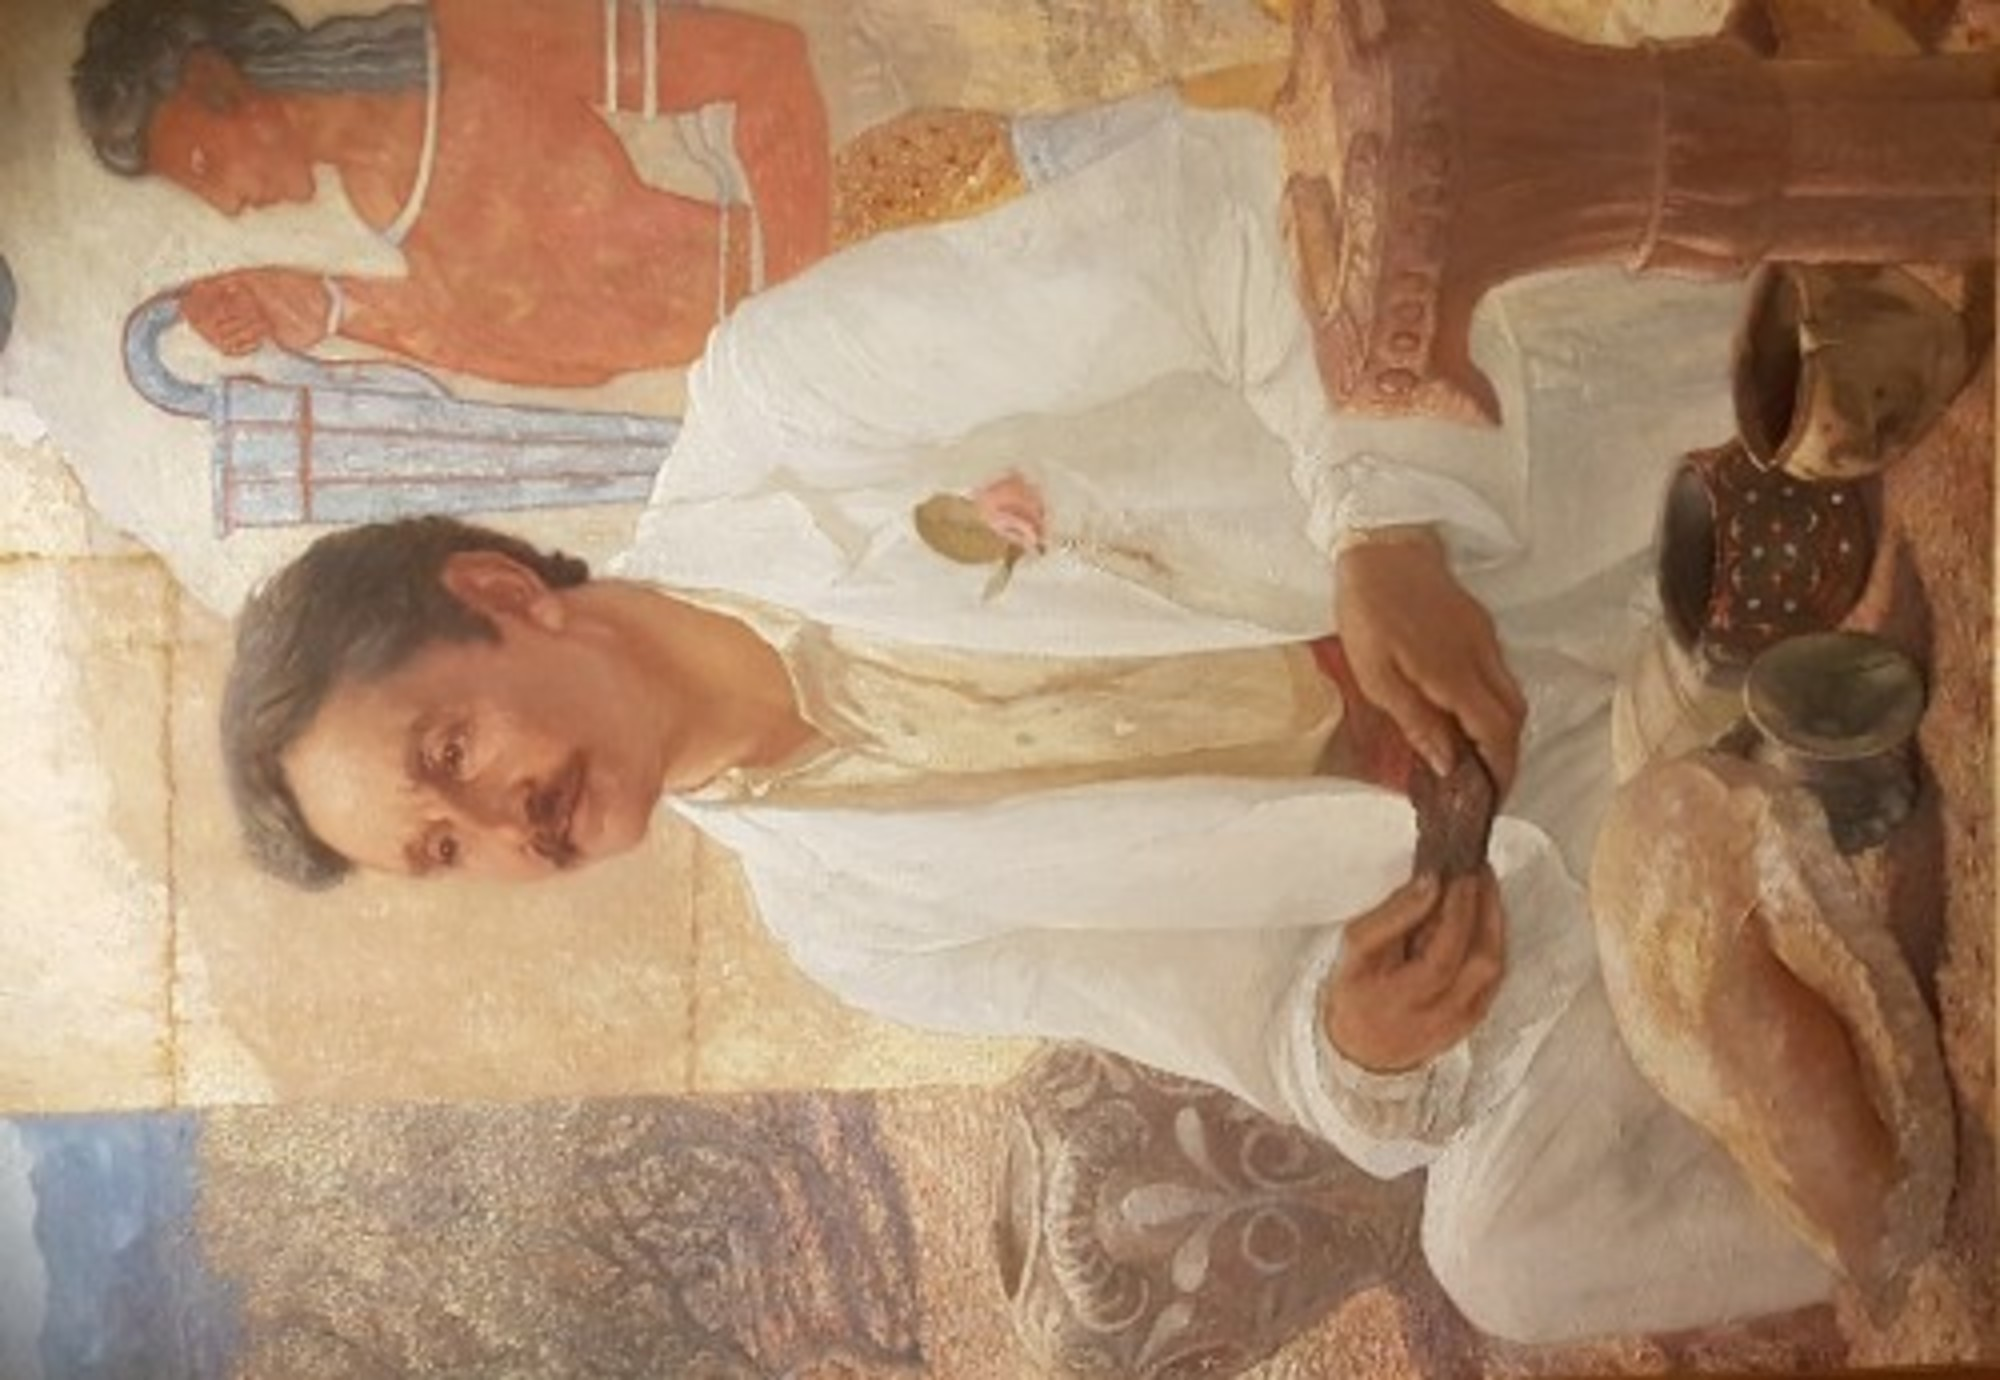 Arthur-Evans-portrait-frameless-1907-by-William-Richmond-Ashmolean-Museum-Oxford.jpg